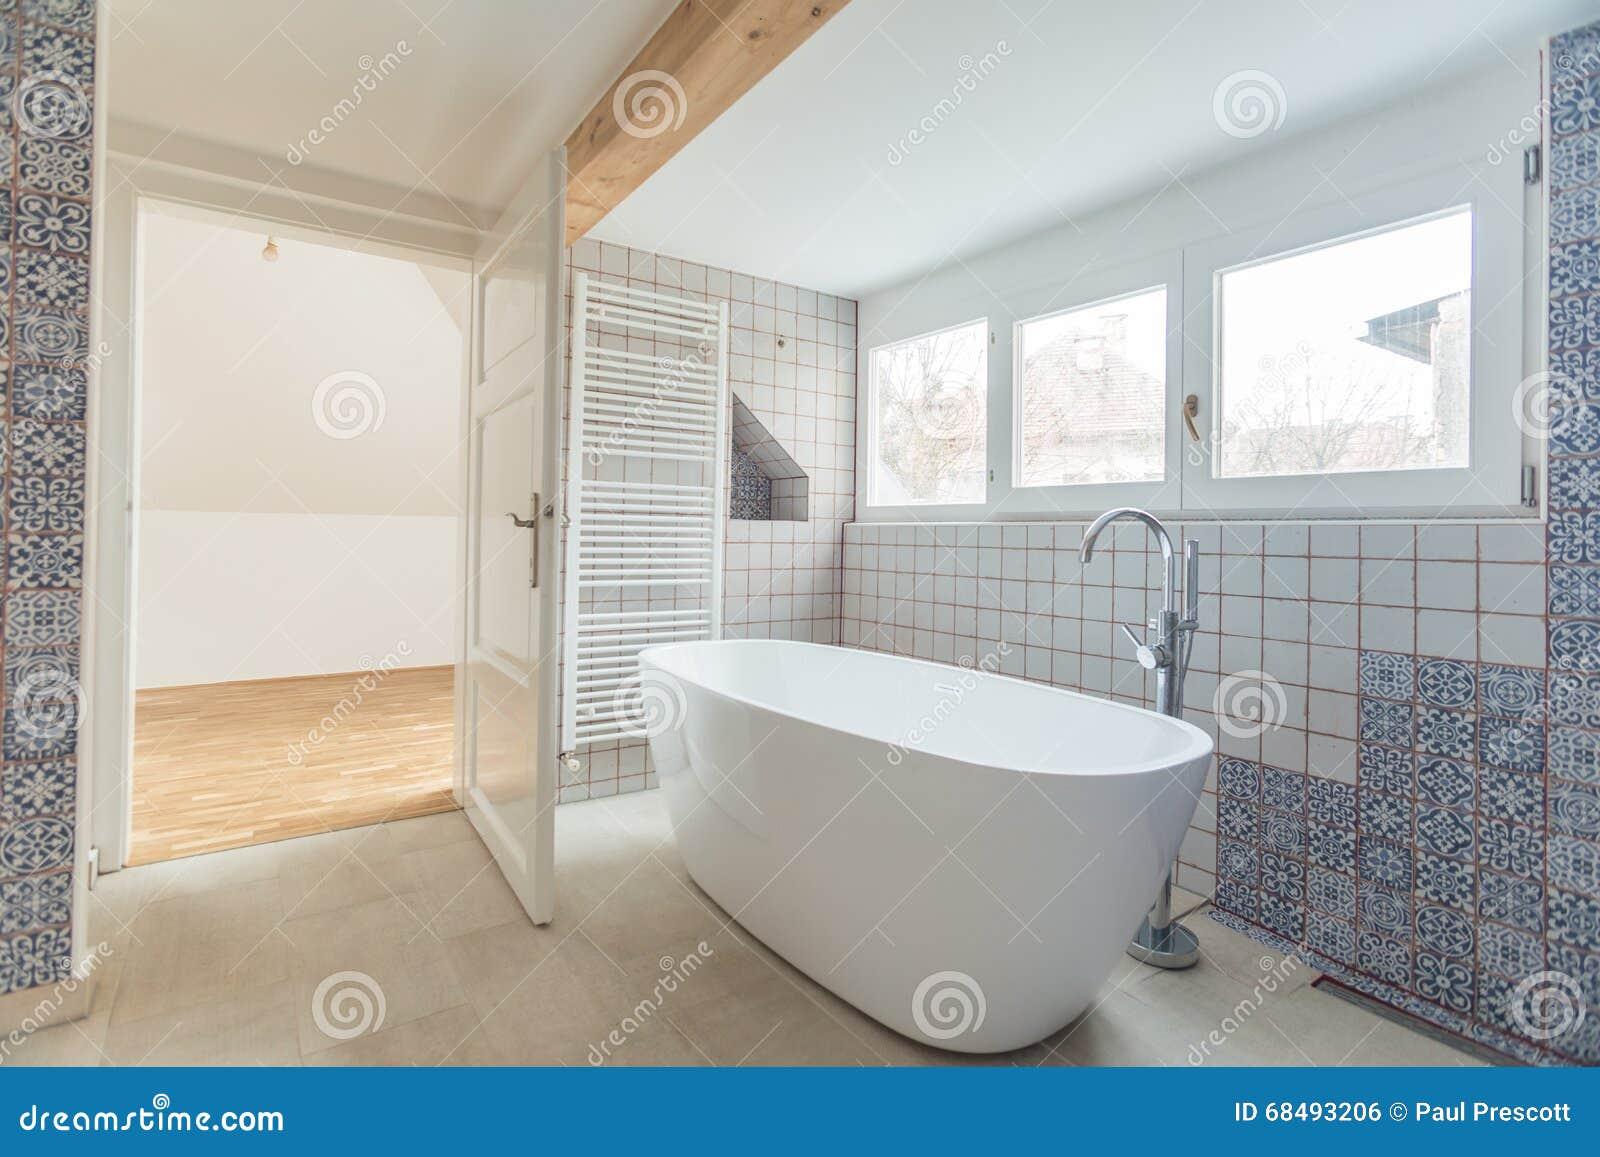 Sala Da Bagno Moderna : Stanza da bagno moderna vuota fotografia stock immagine di bagno